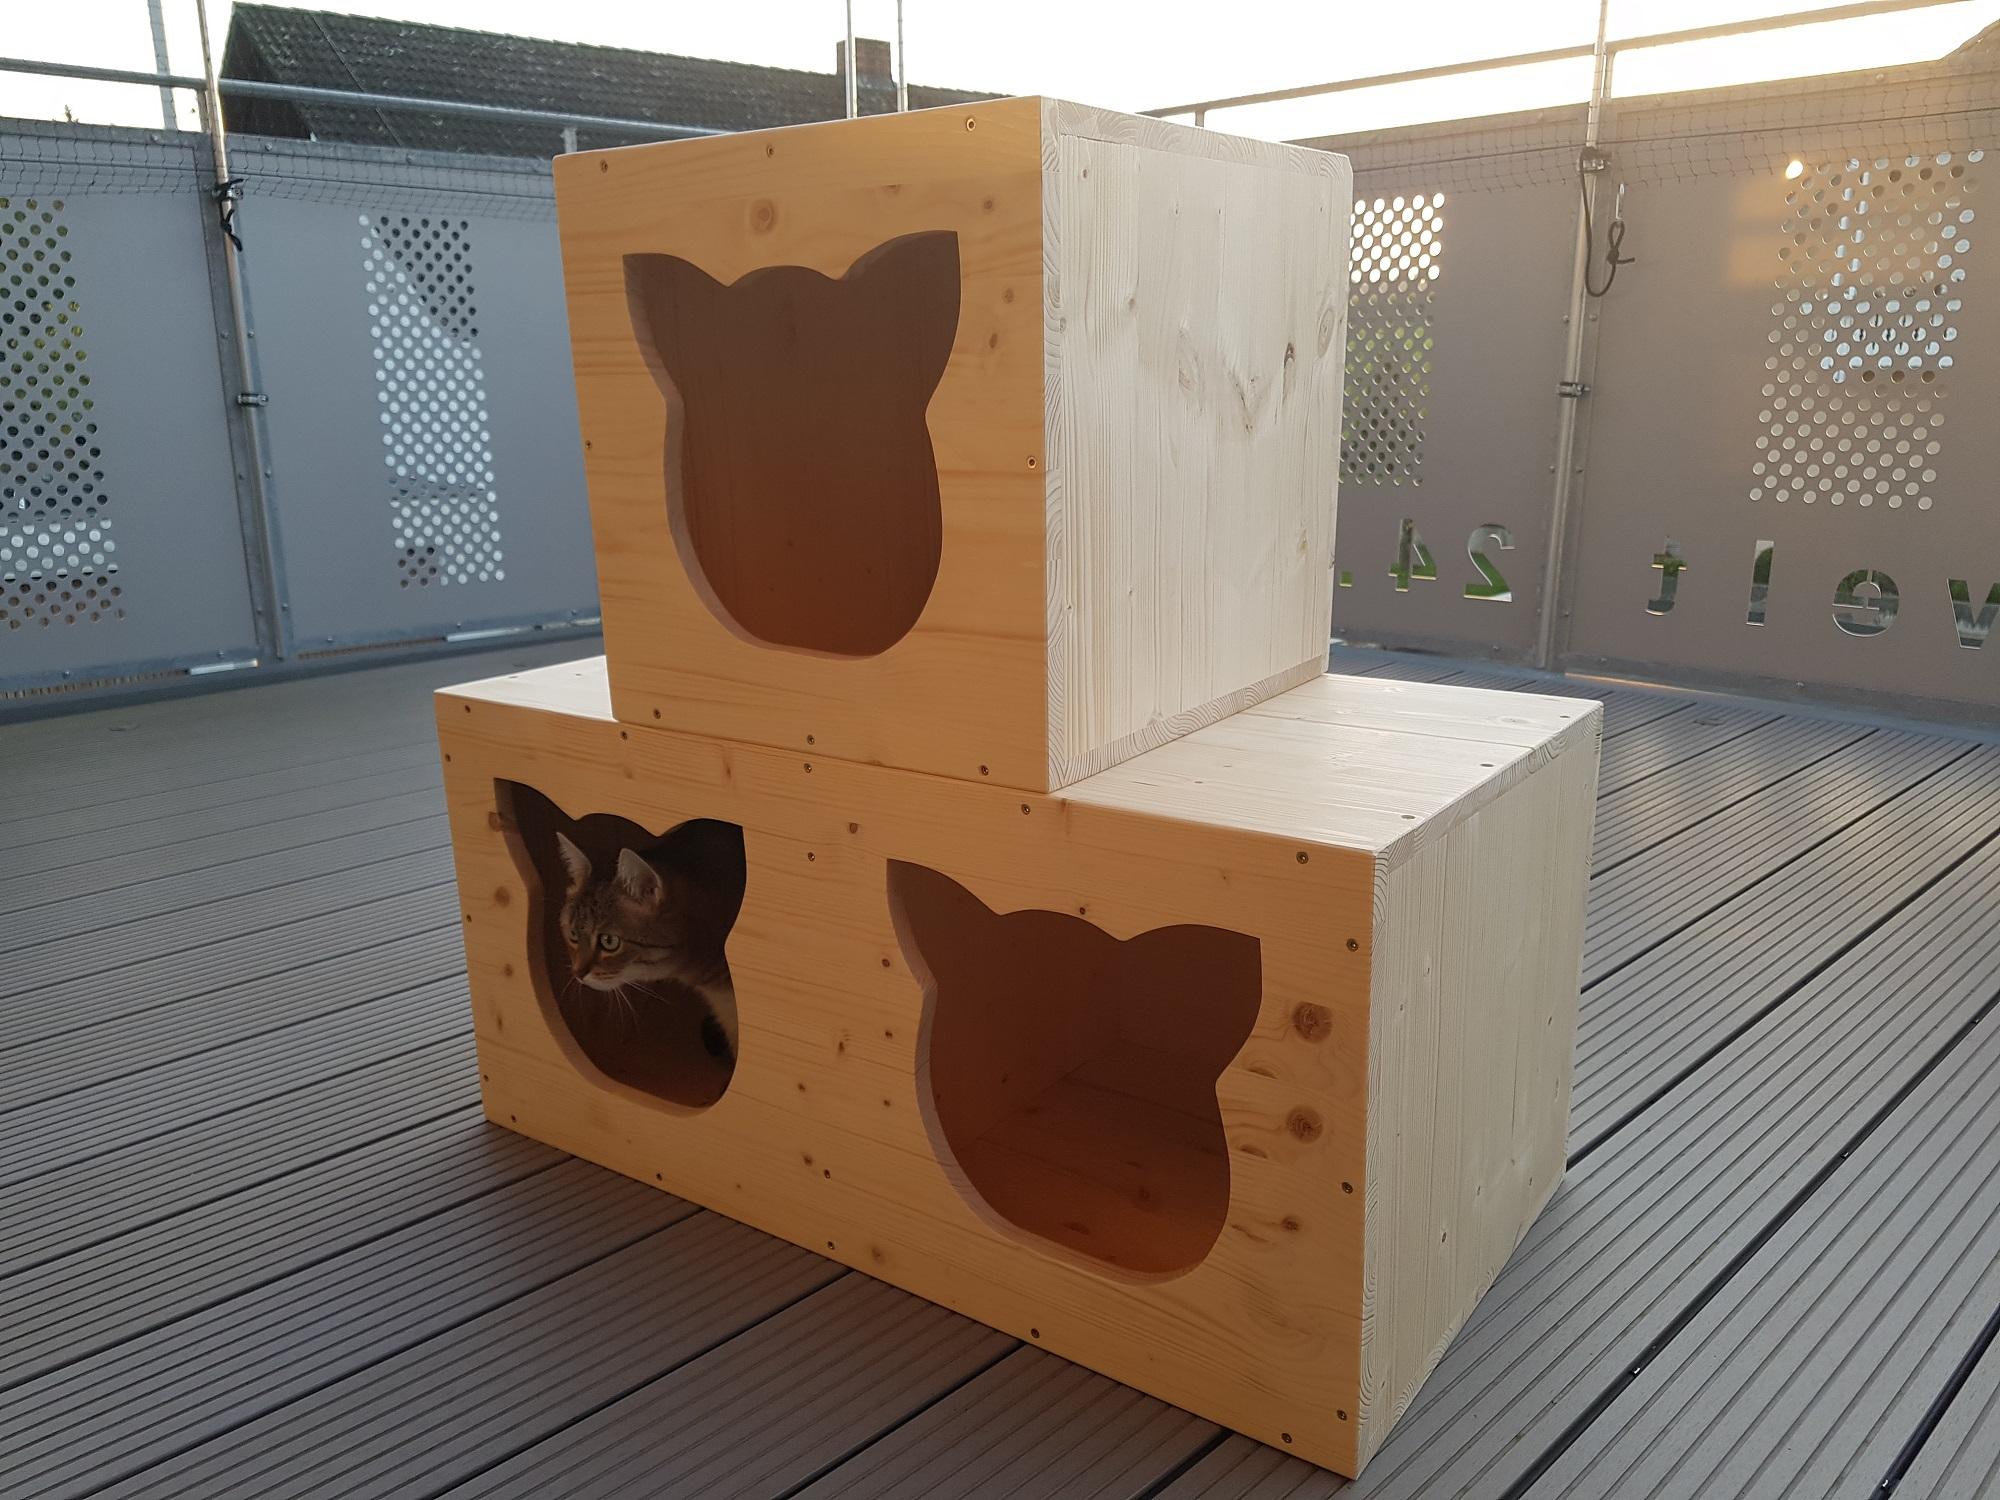 schlafplatz f r katzen katzenh hle kuschelh hle f r katzen. Black Bedroom Furniture Sets. Home Design Ideas